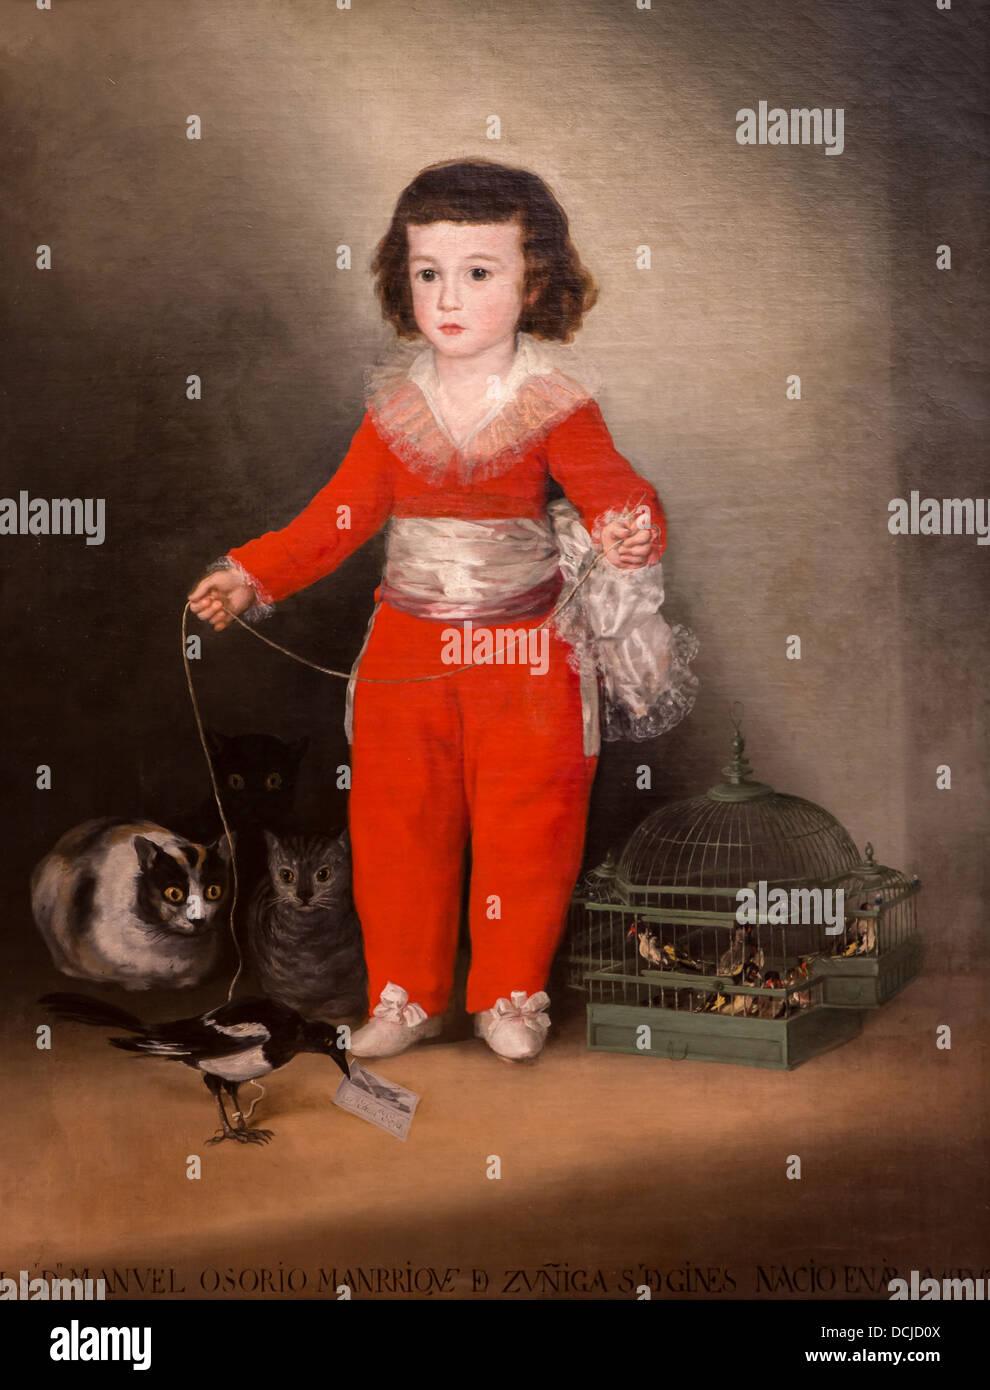 18. Jahrhundert - Manuel Osorto Manrique von Zuniga, 1787 - Goya Philippe Sauvan-Magnet / aktive Museum Stockbild